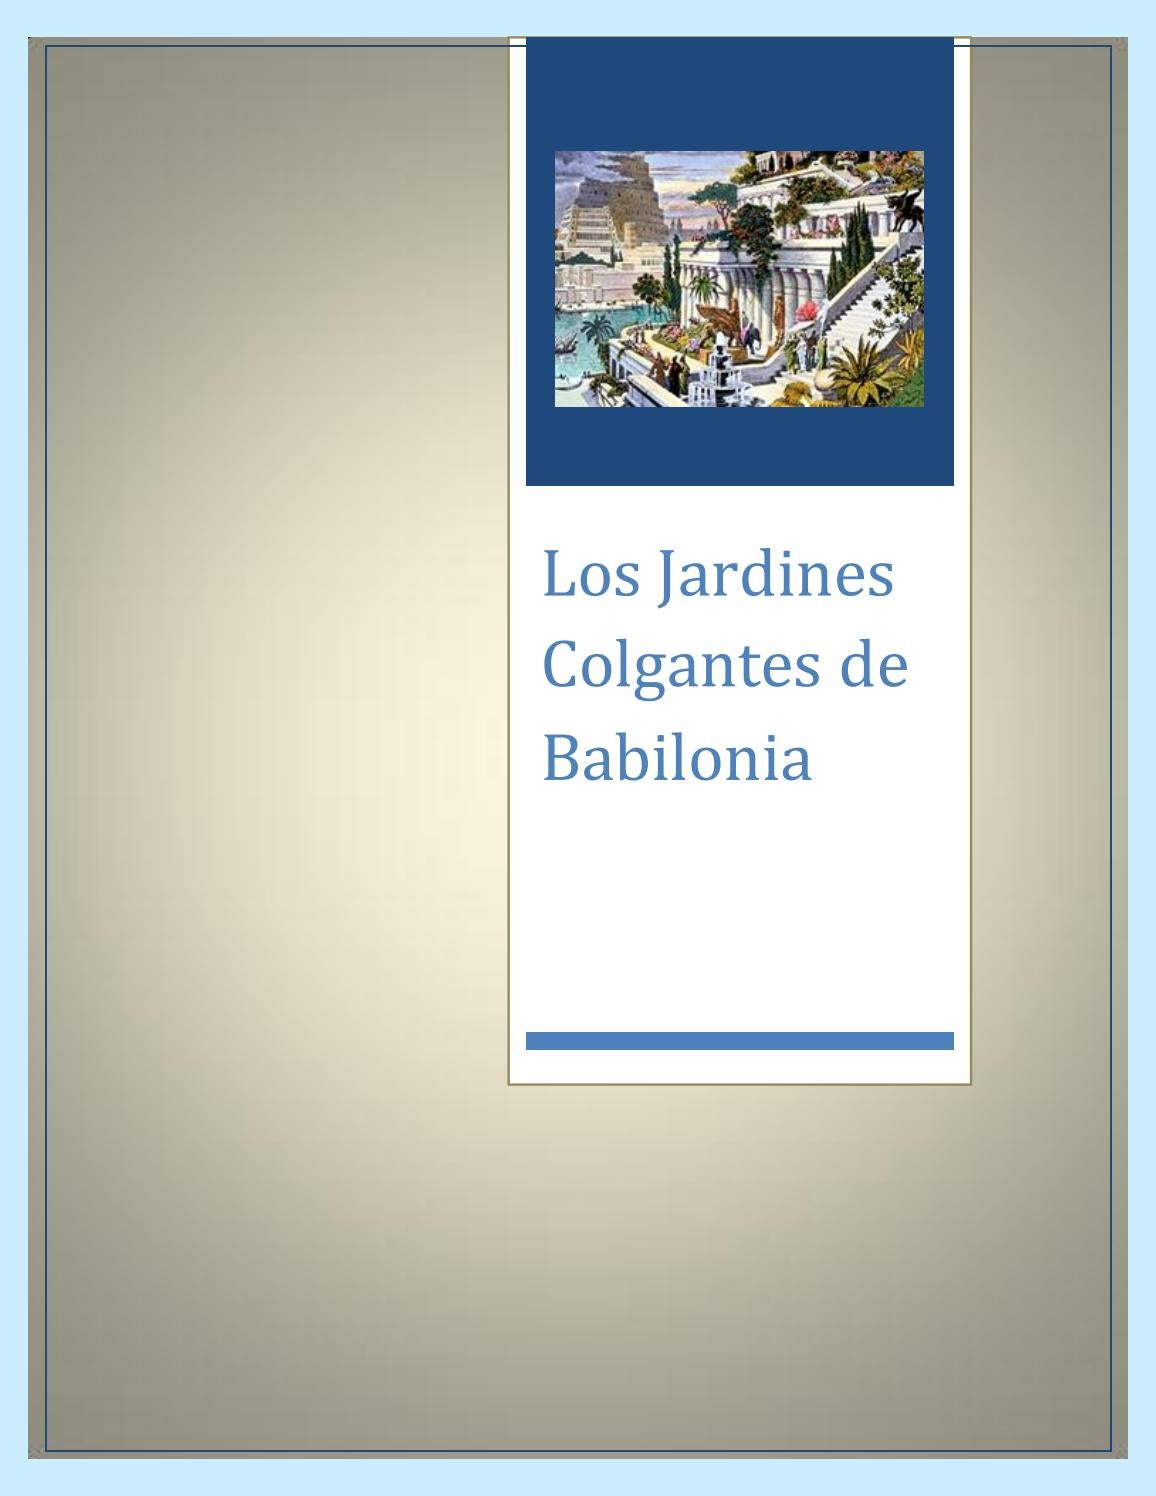 Los Jardines Colgante De Babilonia By Eimyxestradl Issuu